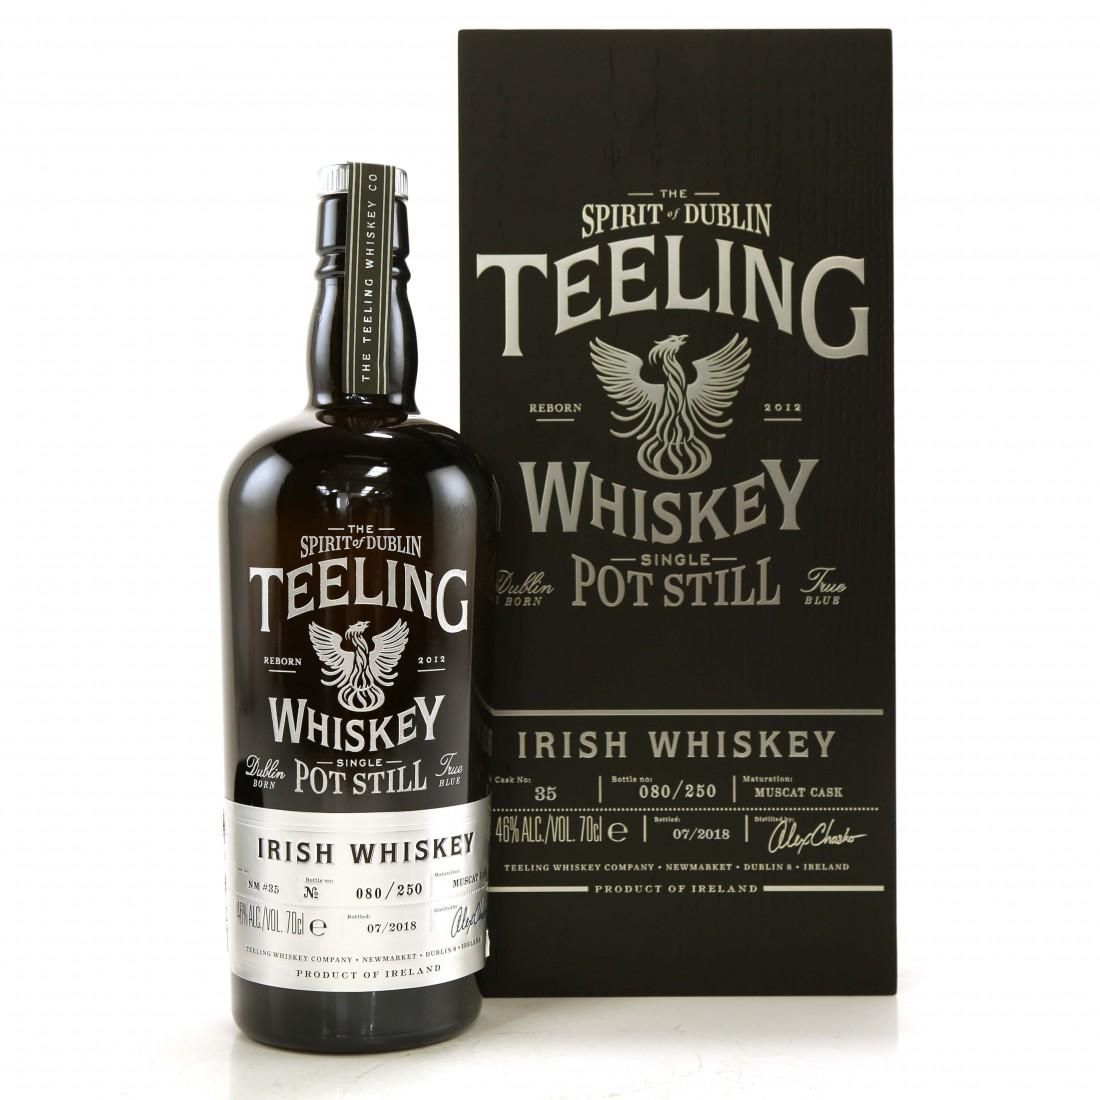 Teeling Celebratory Single Pot Still Whiskey / Bottle #080